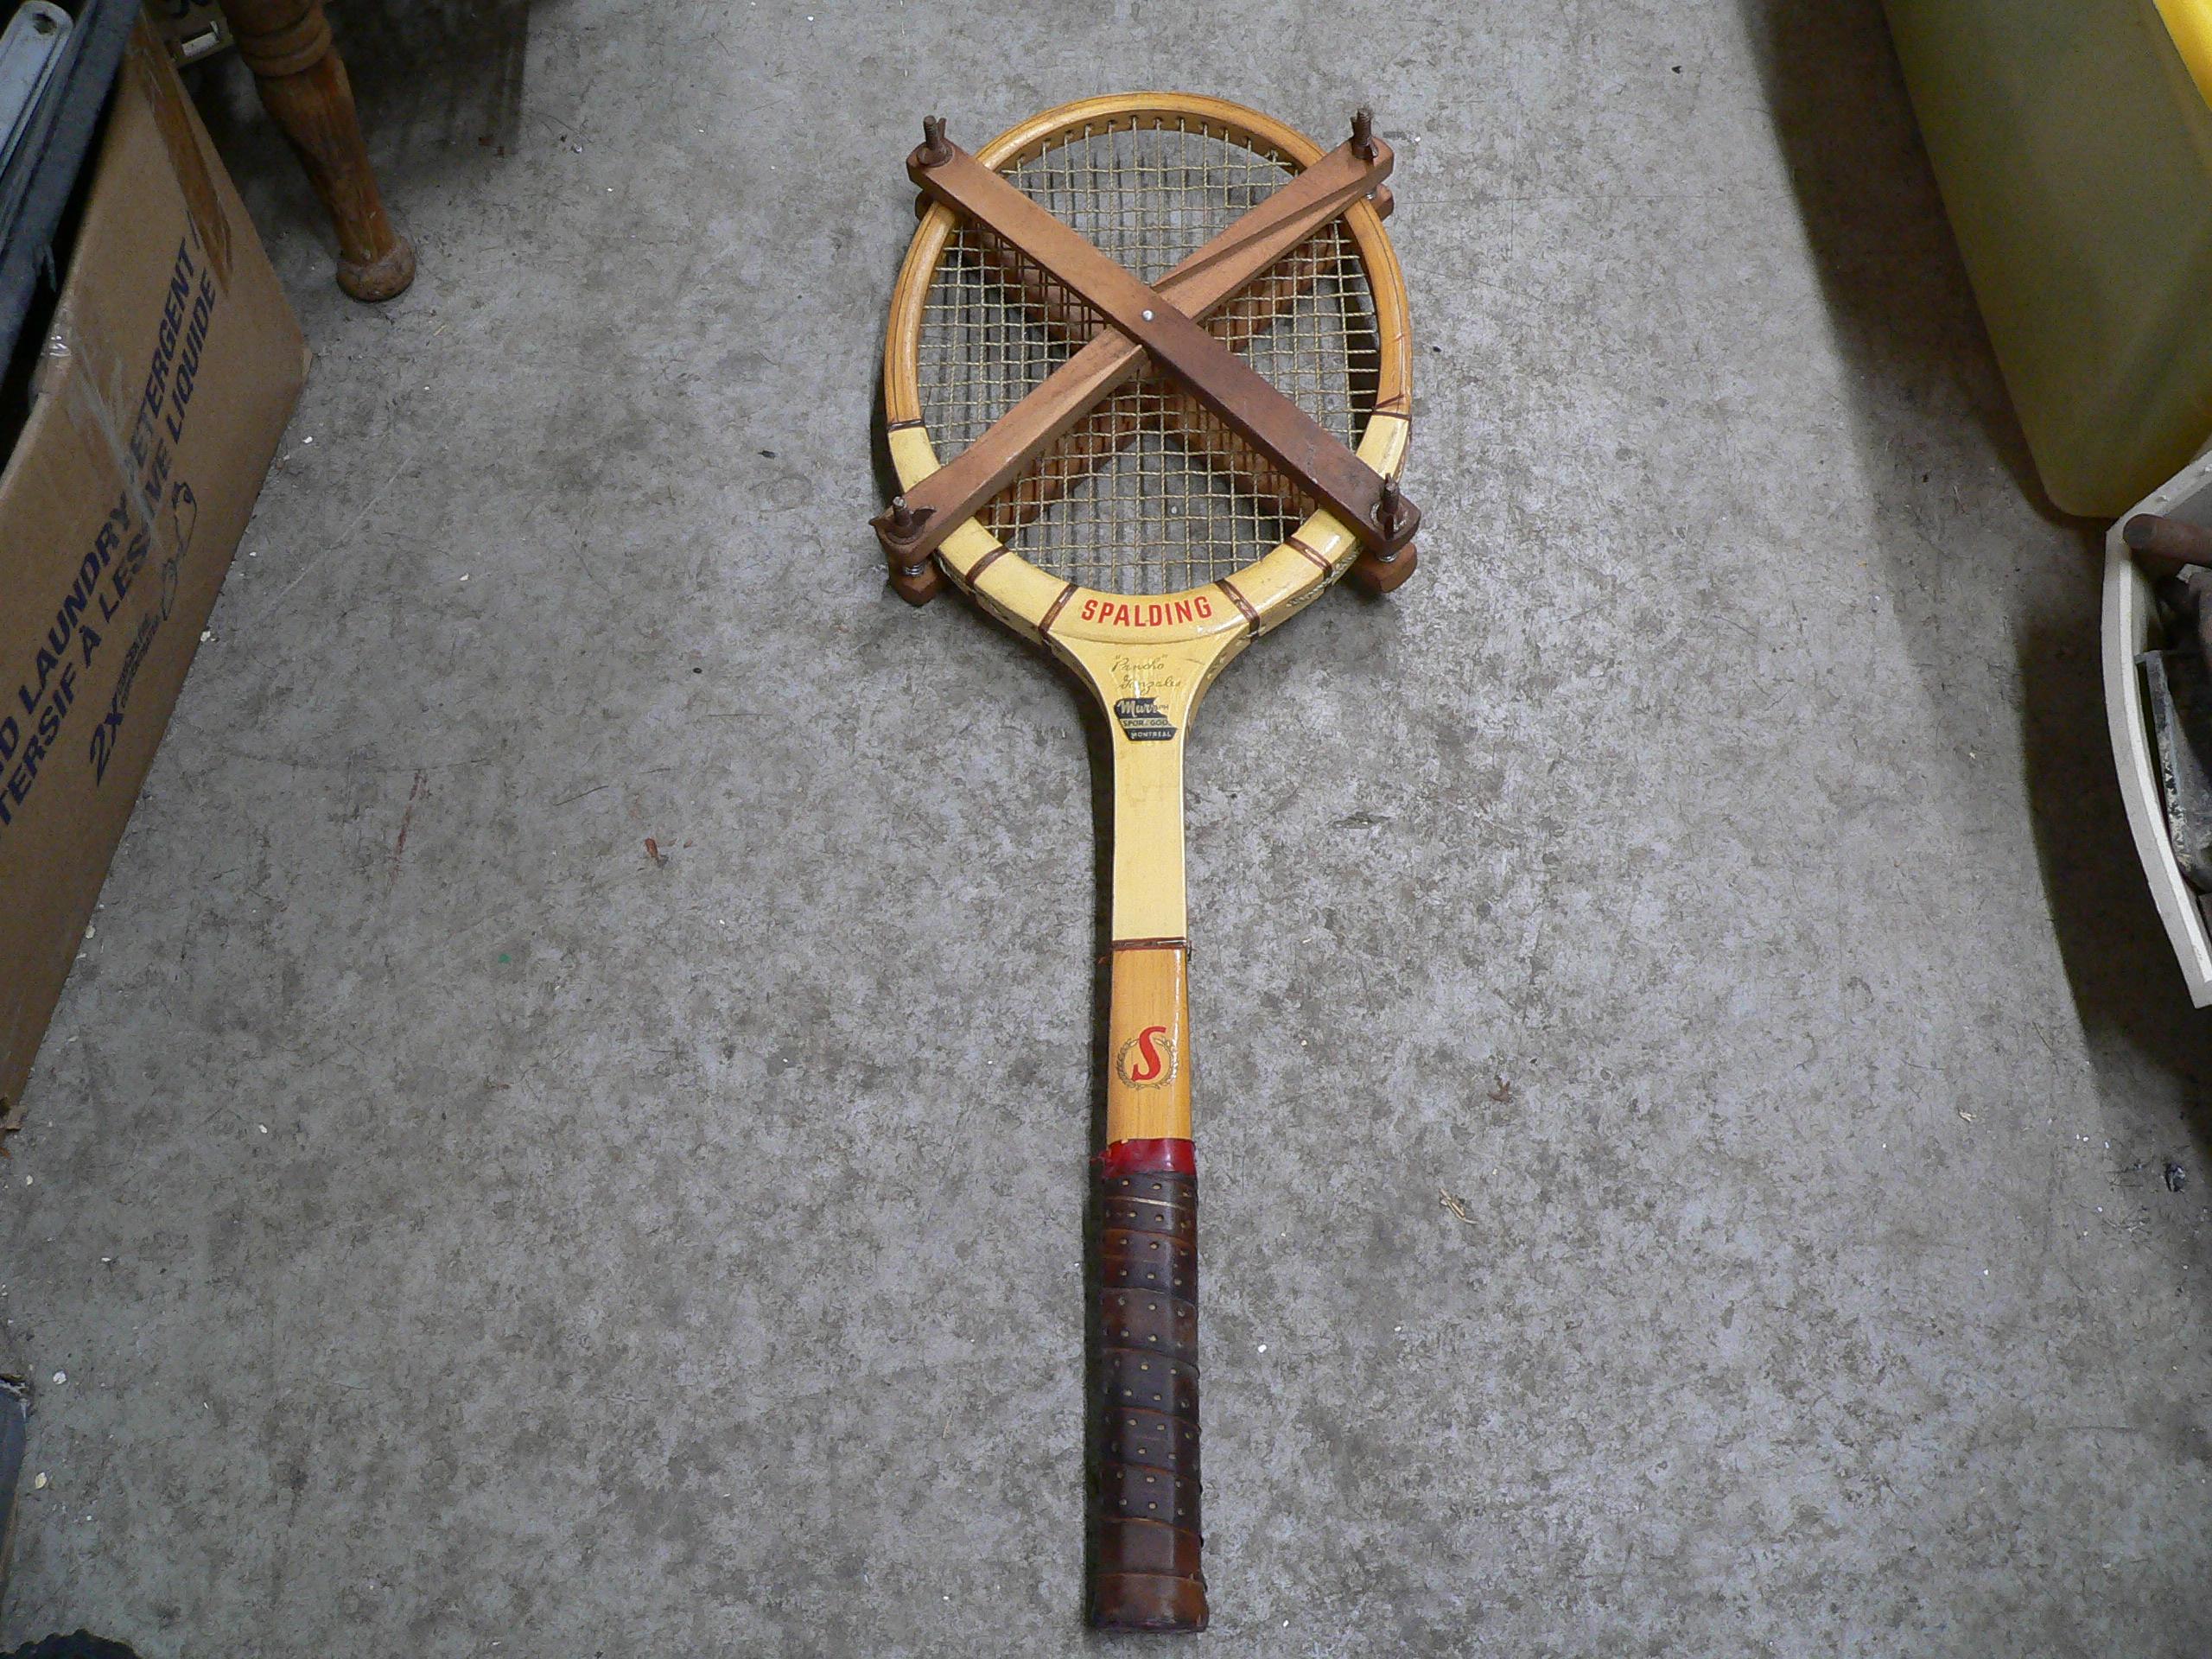 Raquette de tennis vintage # 5869.33